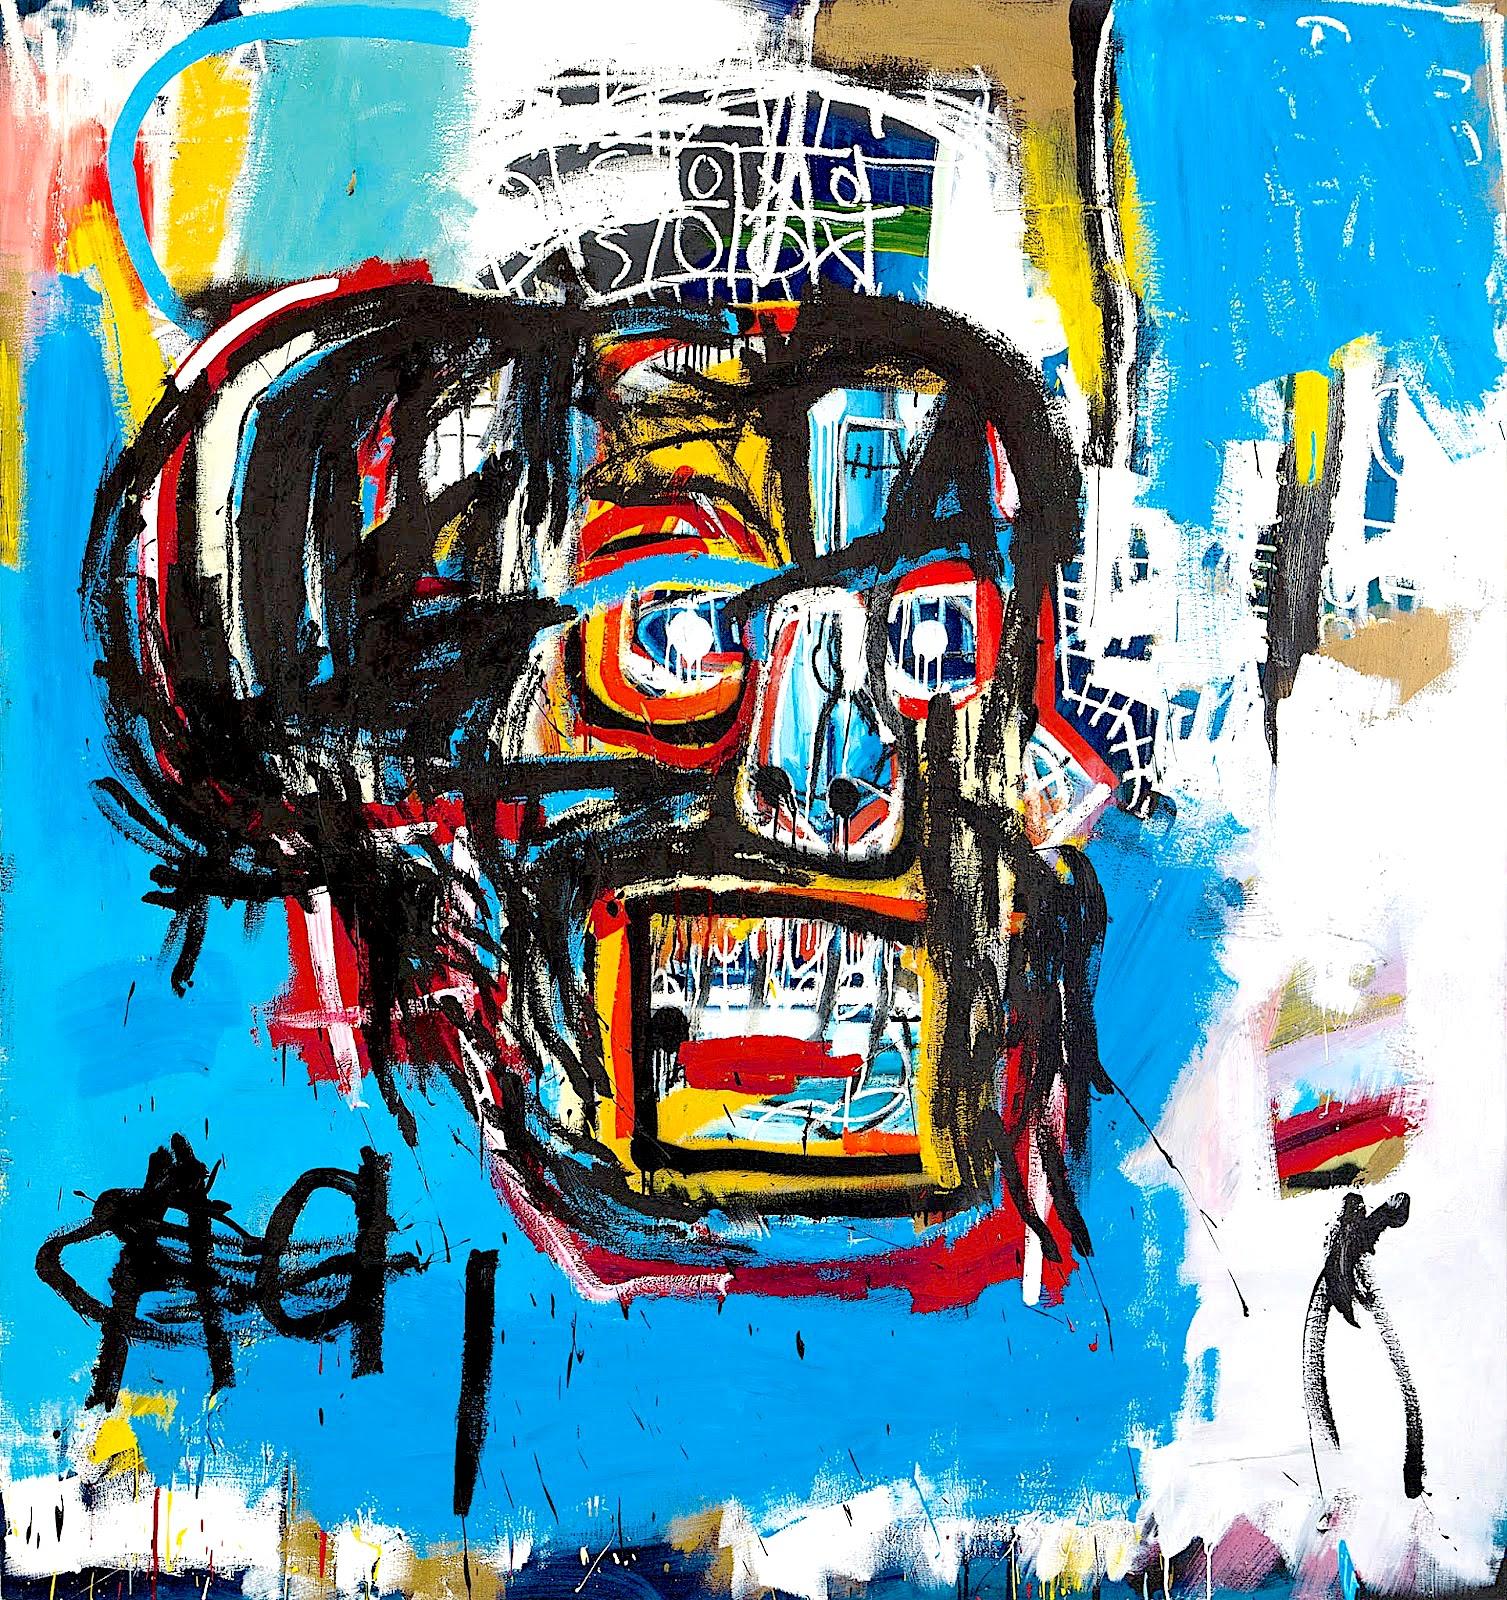 jean-michel_basquiat_untitled_high_res_2000w.jpg